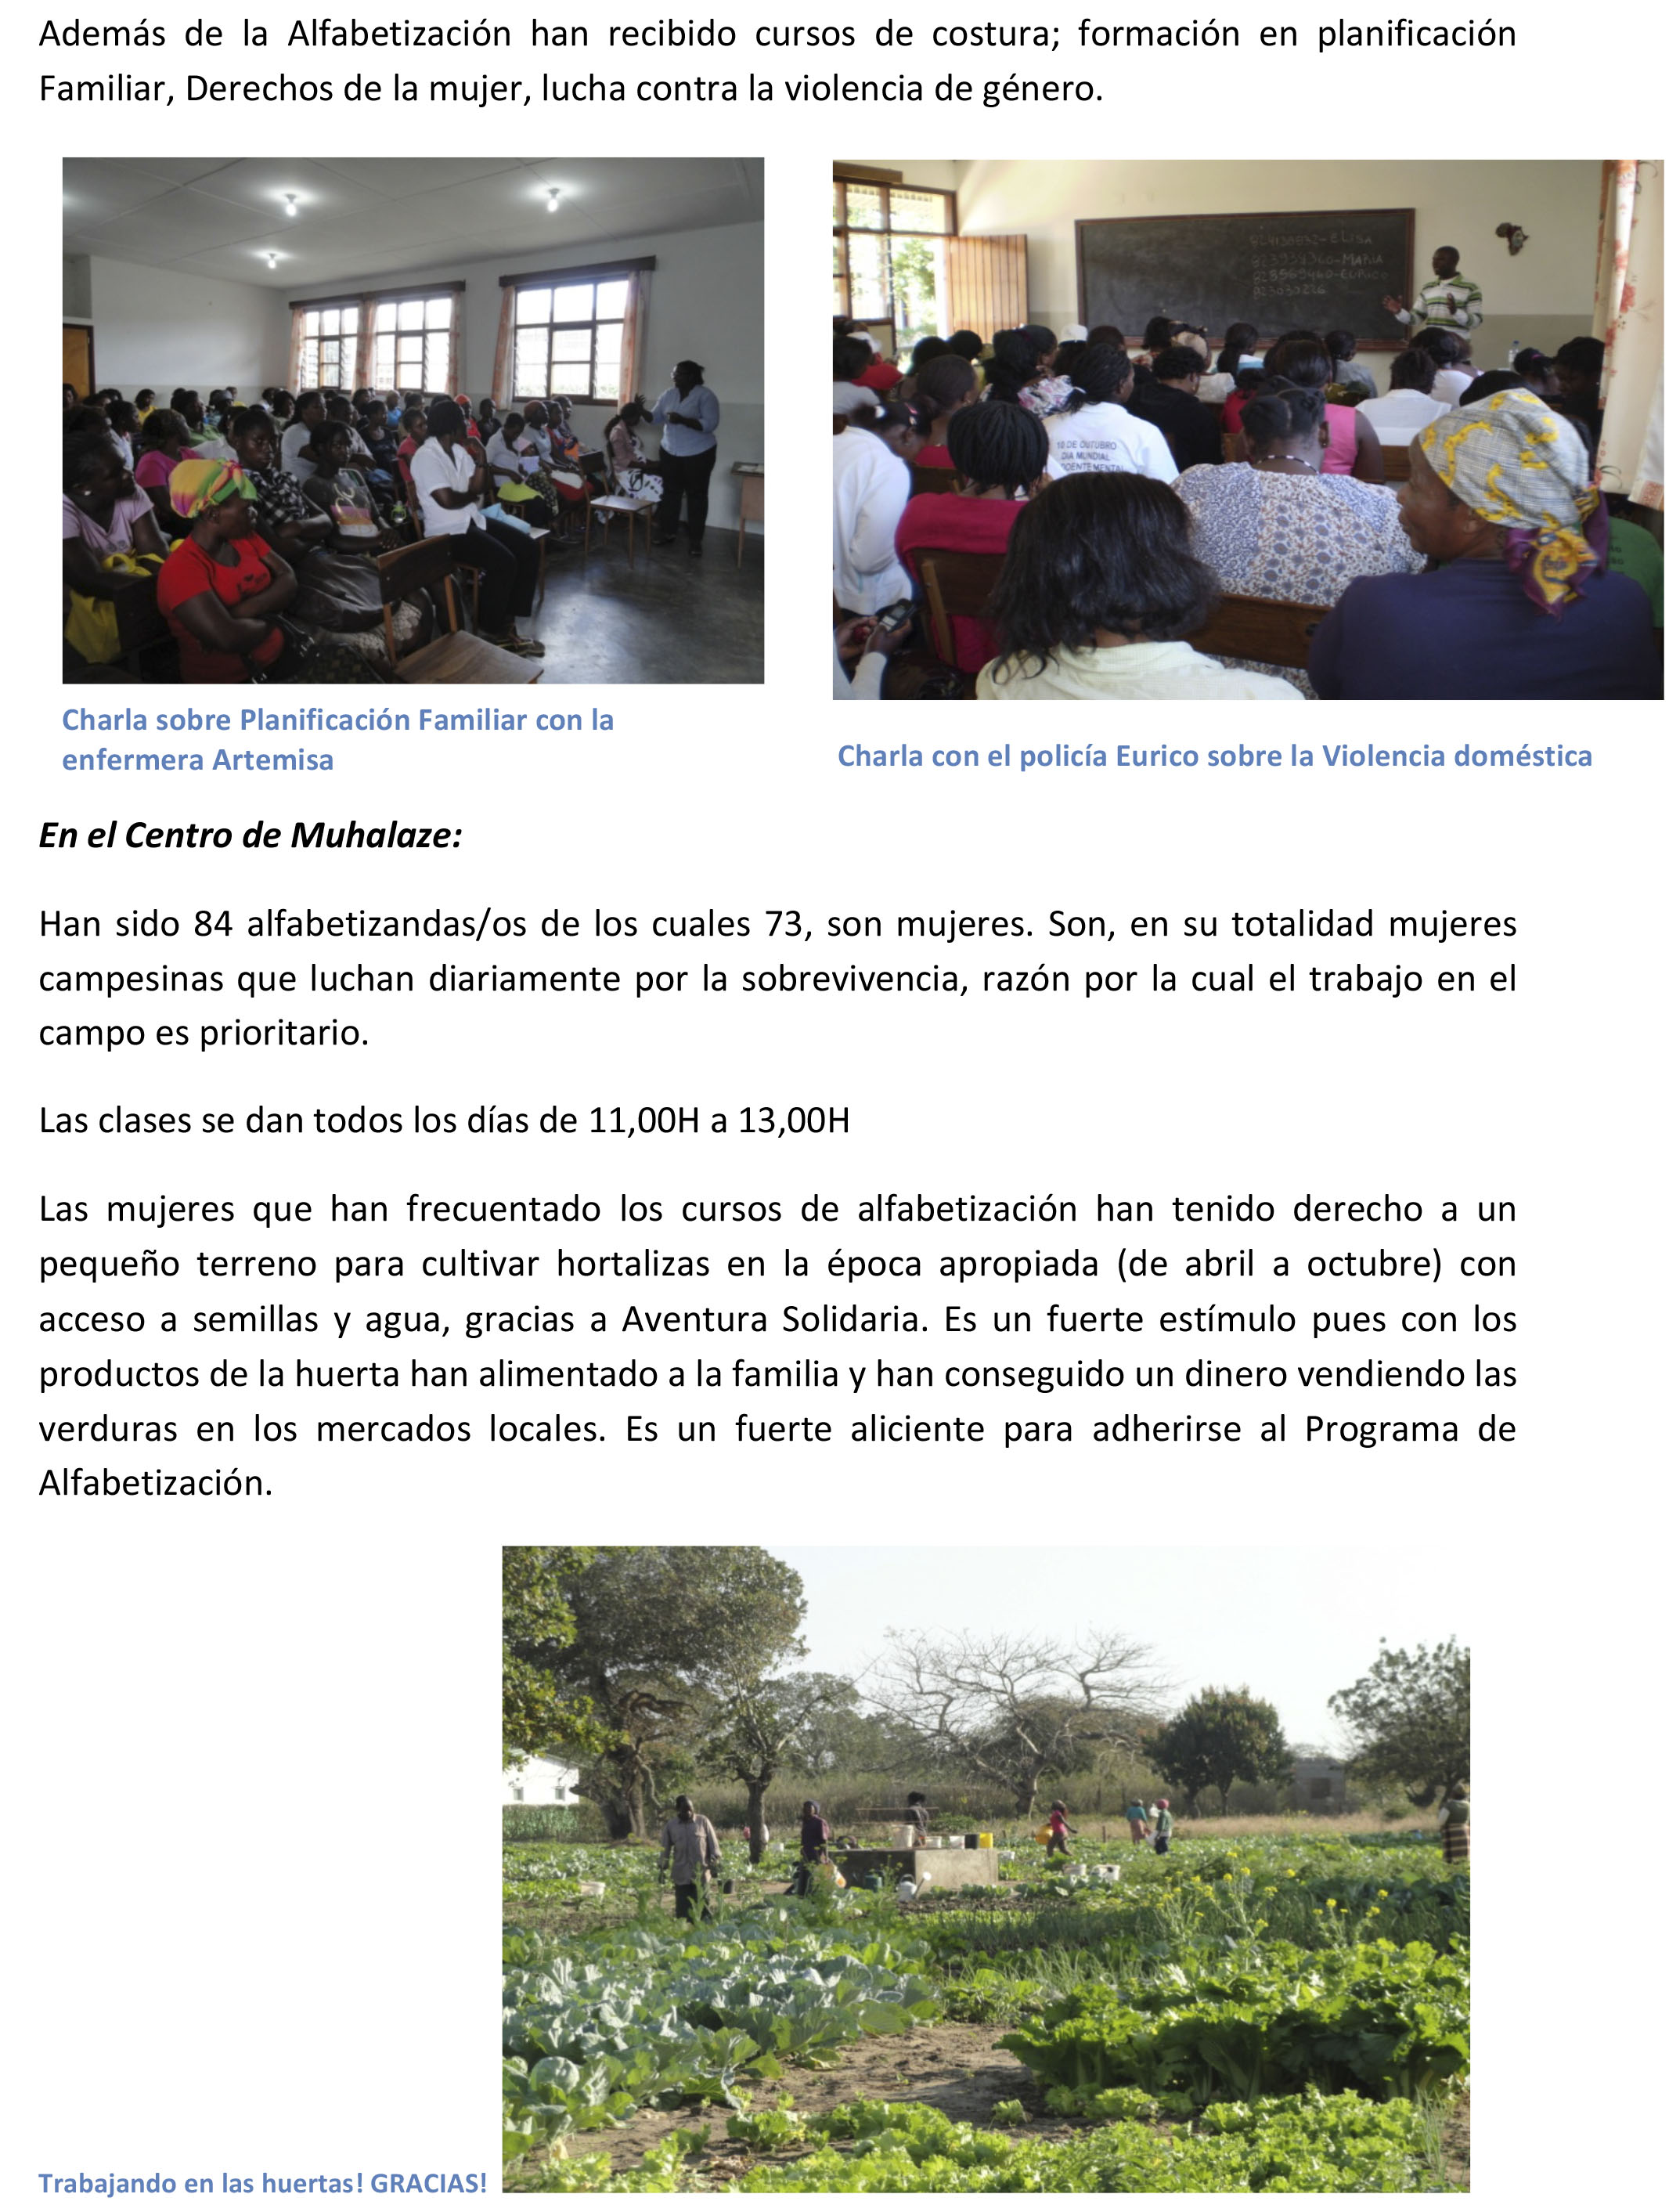 Microsoft Word - Memoria actividades Khongolote 2013.docx